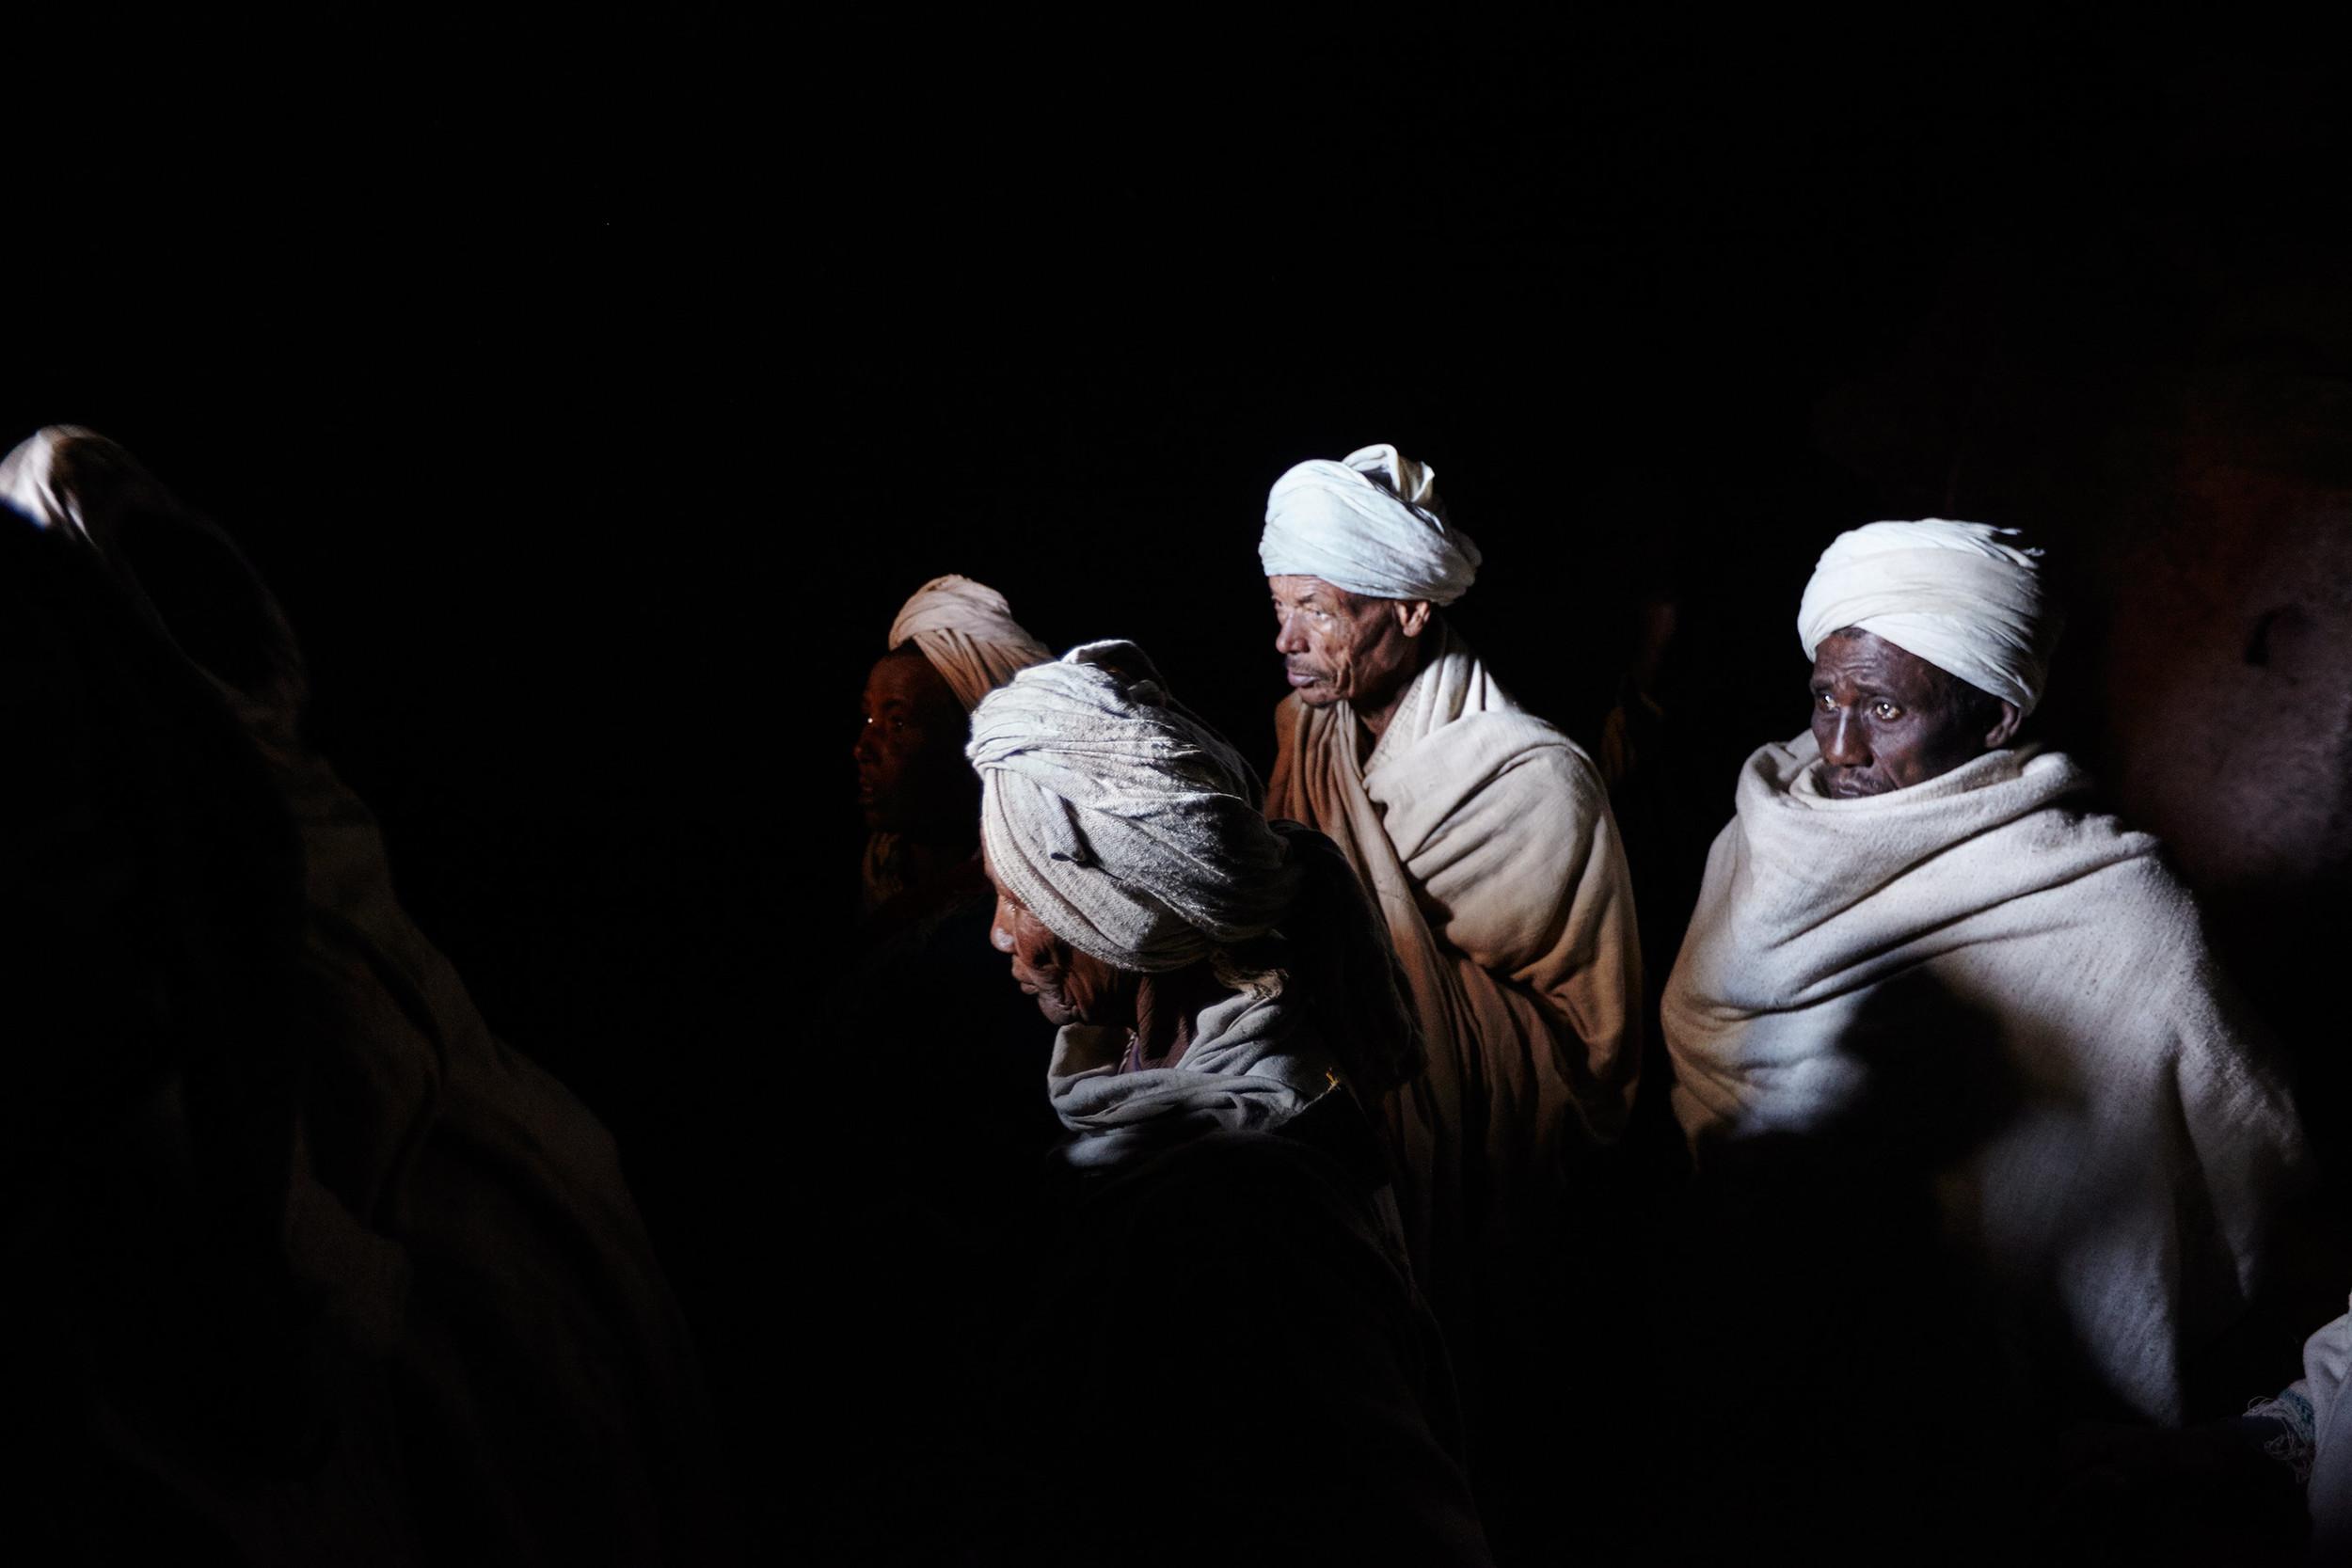 Orthodox Christian pilgrims in Lalibela